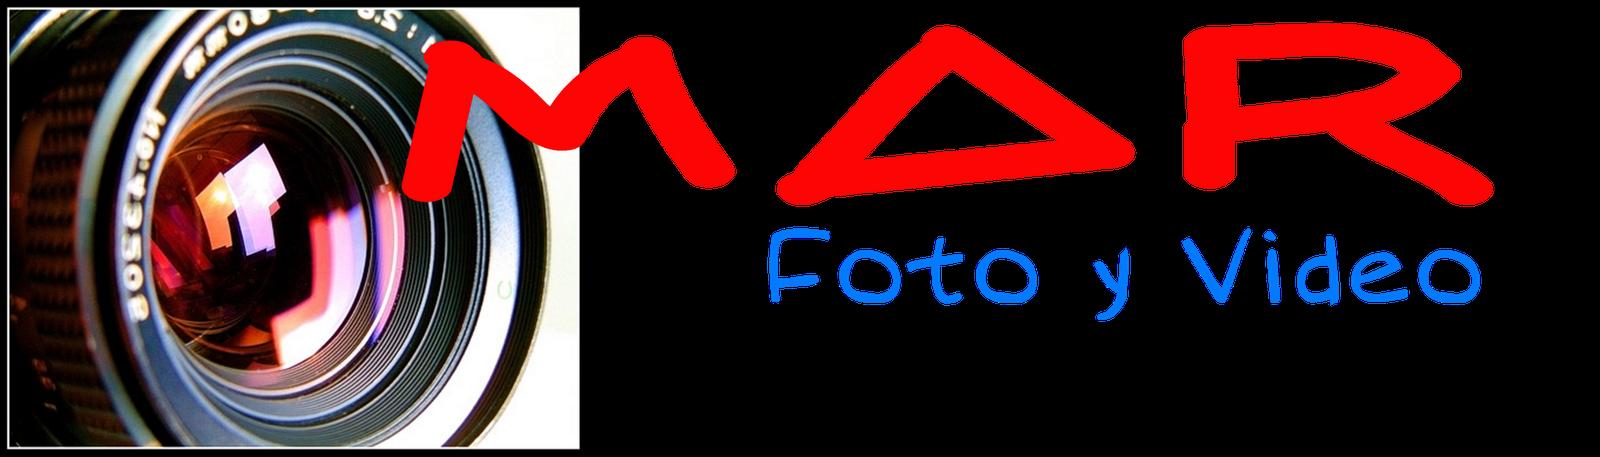 Marfotoyvideo